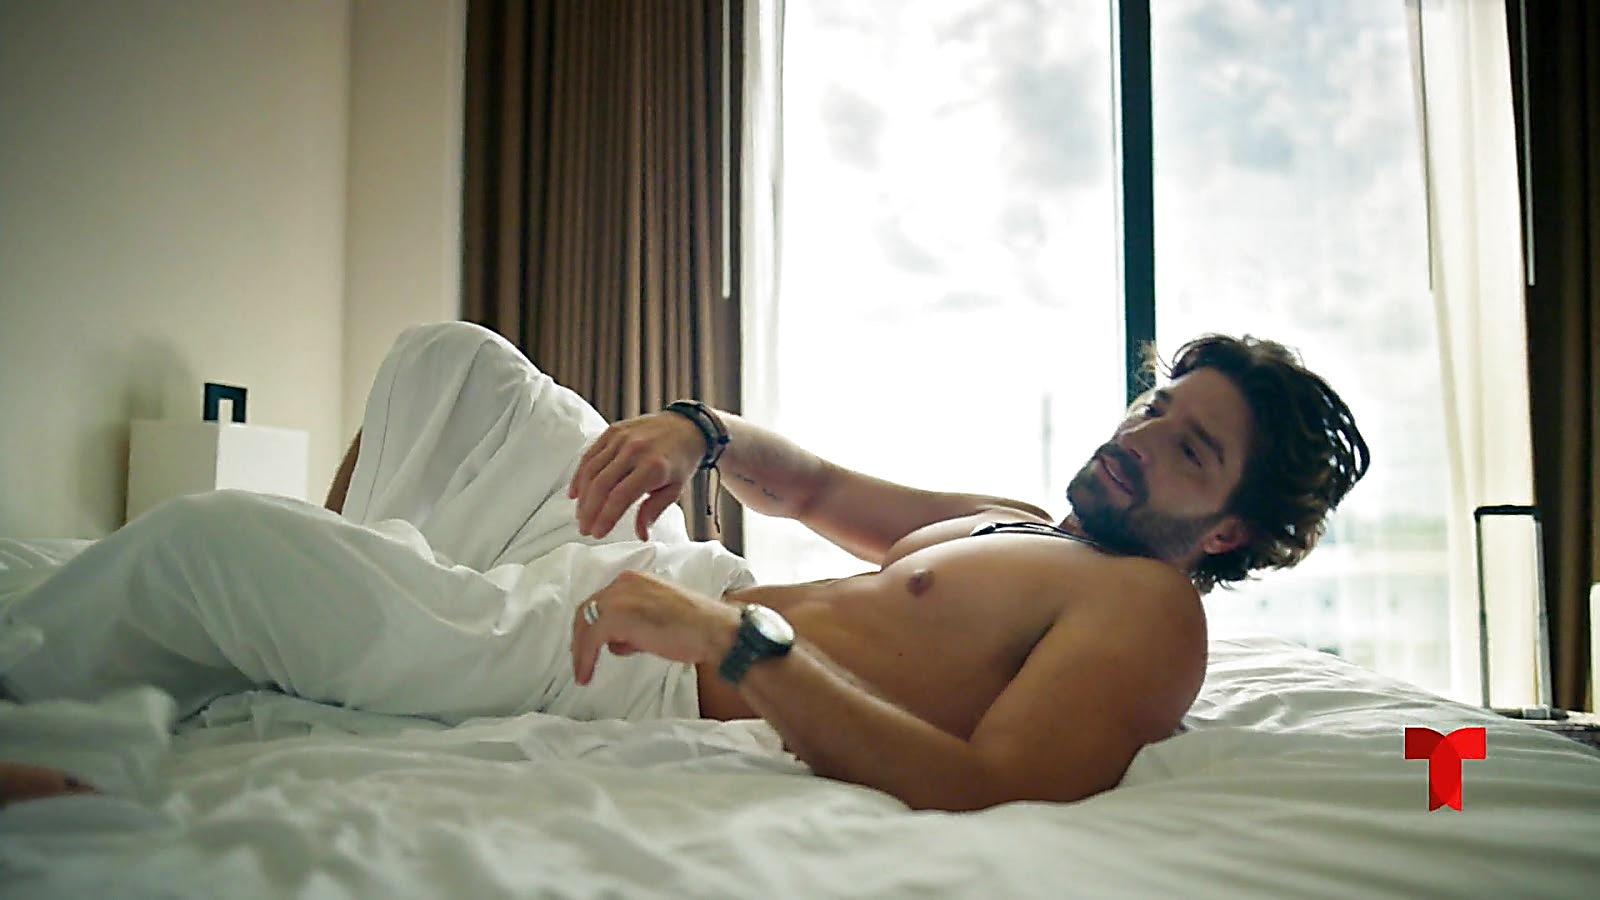 David Chocarro sexy shirtless scene July 11, 2020, 7am